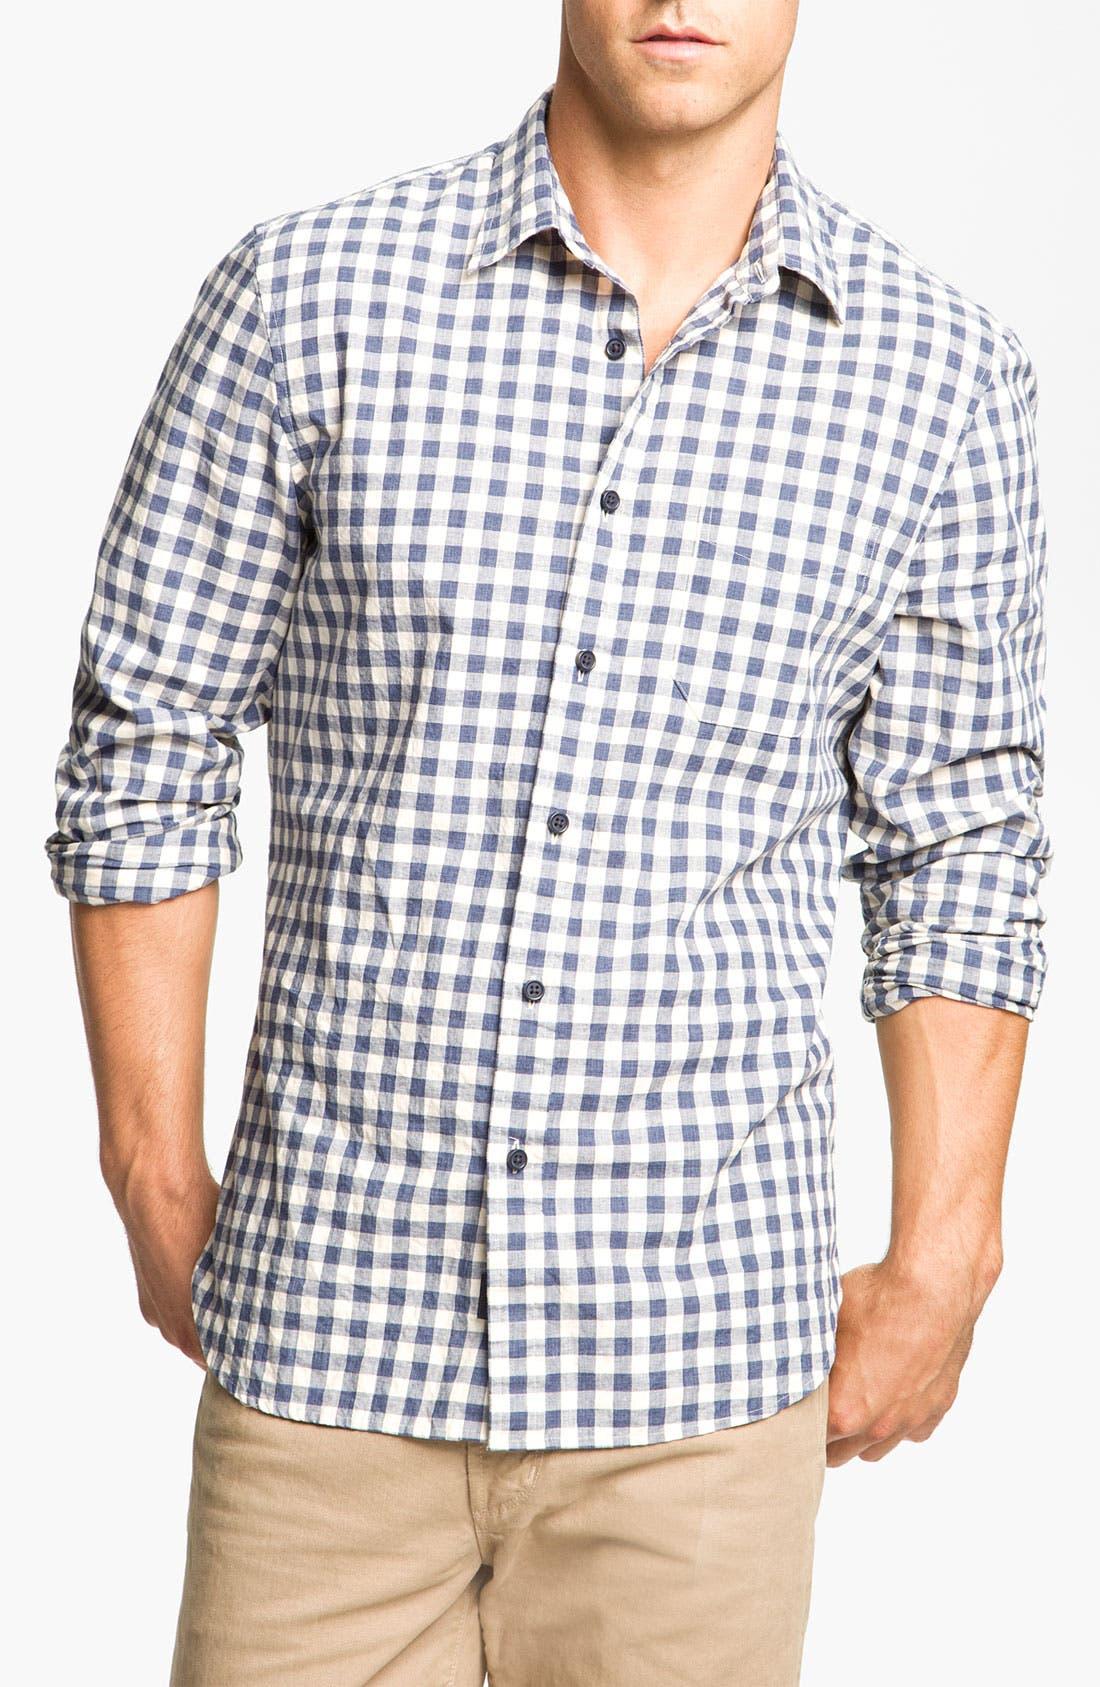 Alternate Image 1 Selected - Wallin & Bros. Check Poplin Sport Shirt